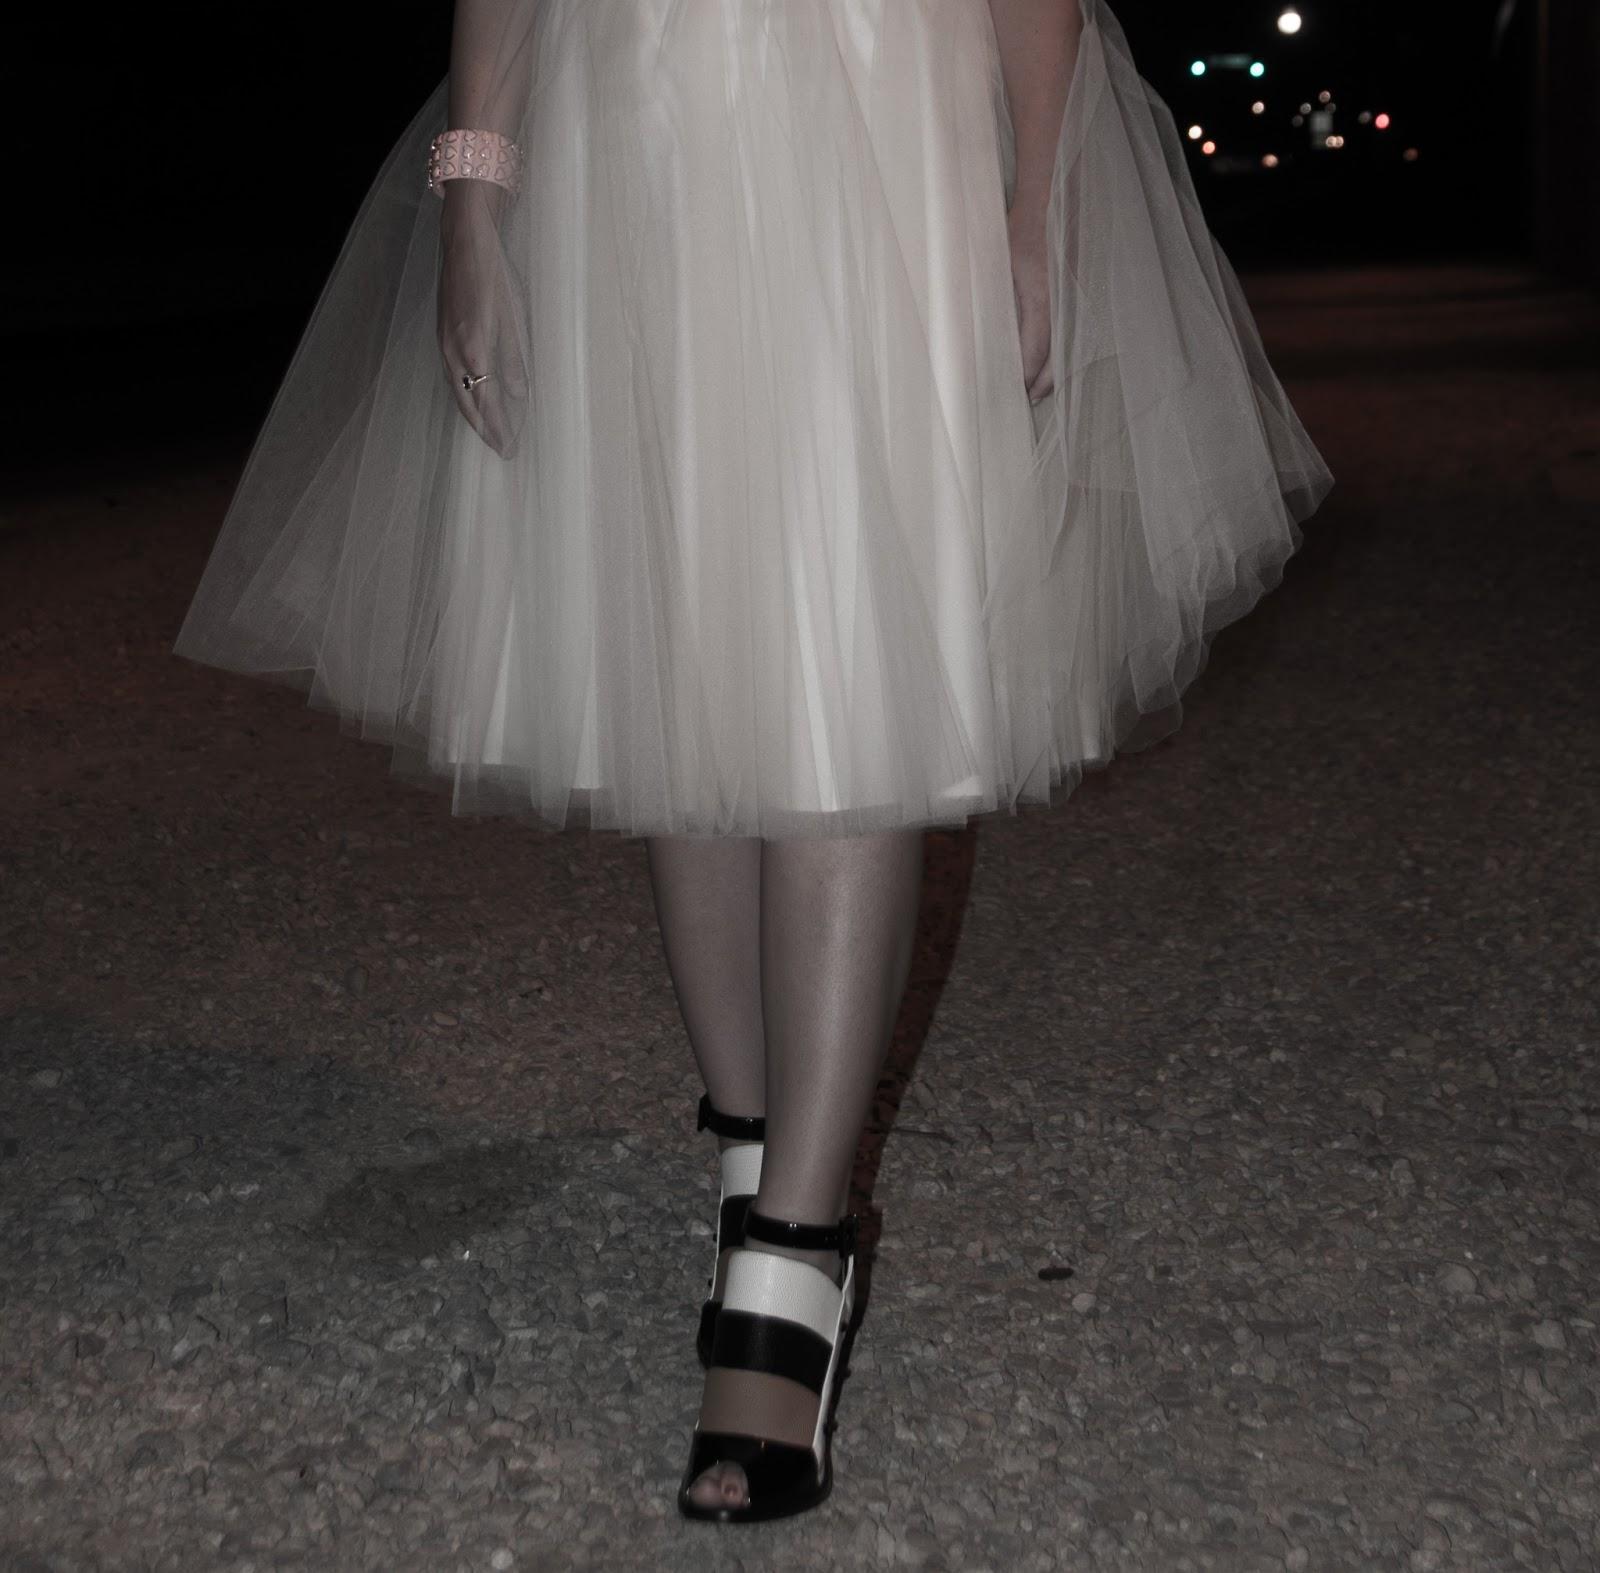 http://www.kelseybang.com/2013/03/tutus-pearls-and-ninja-hair.html